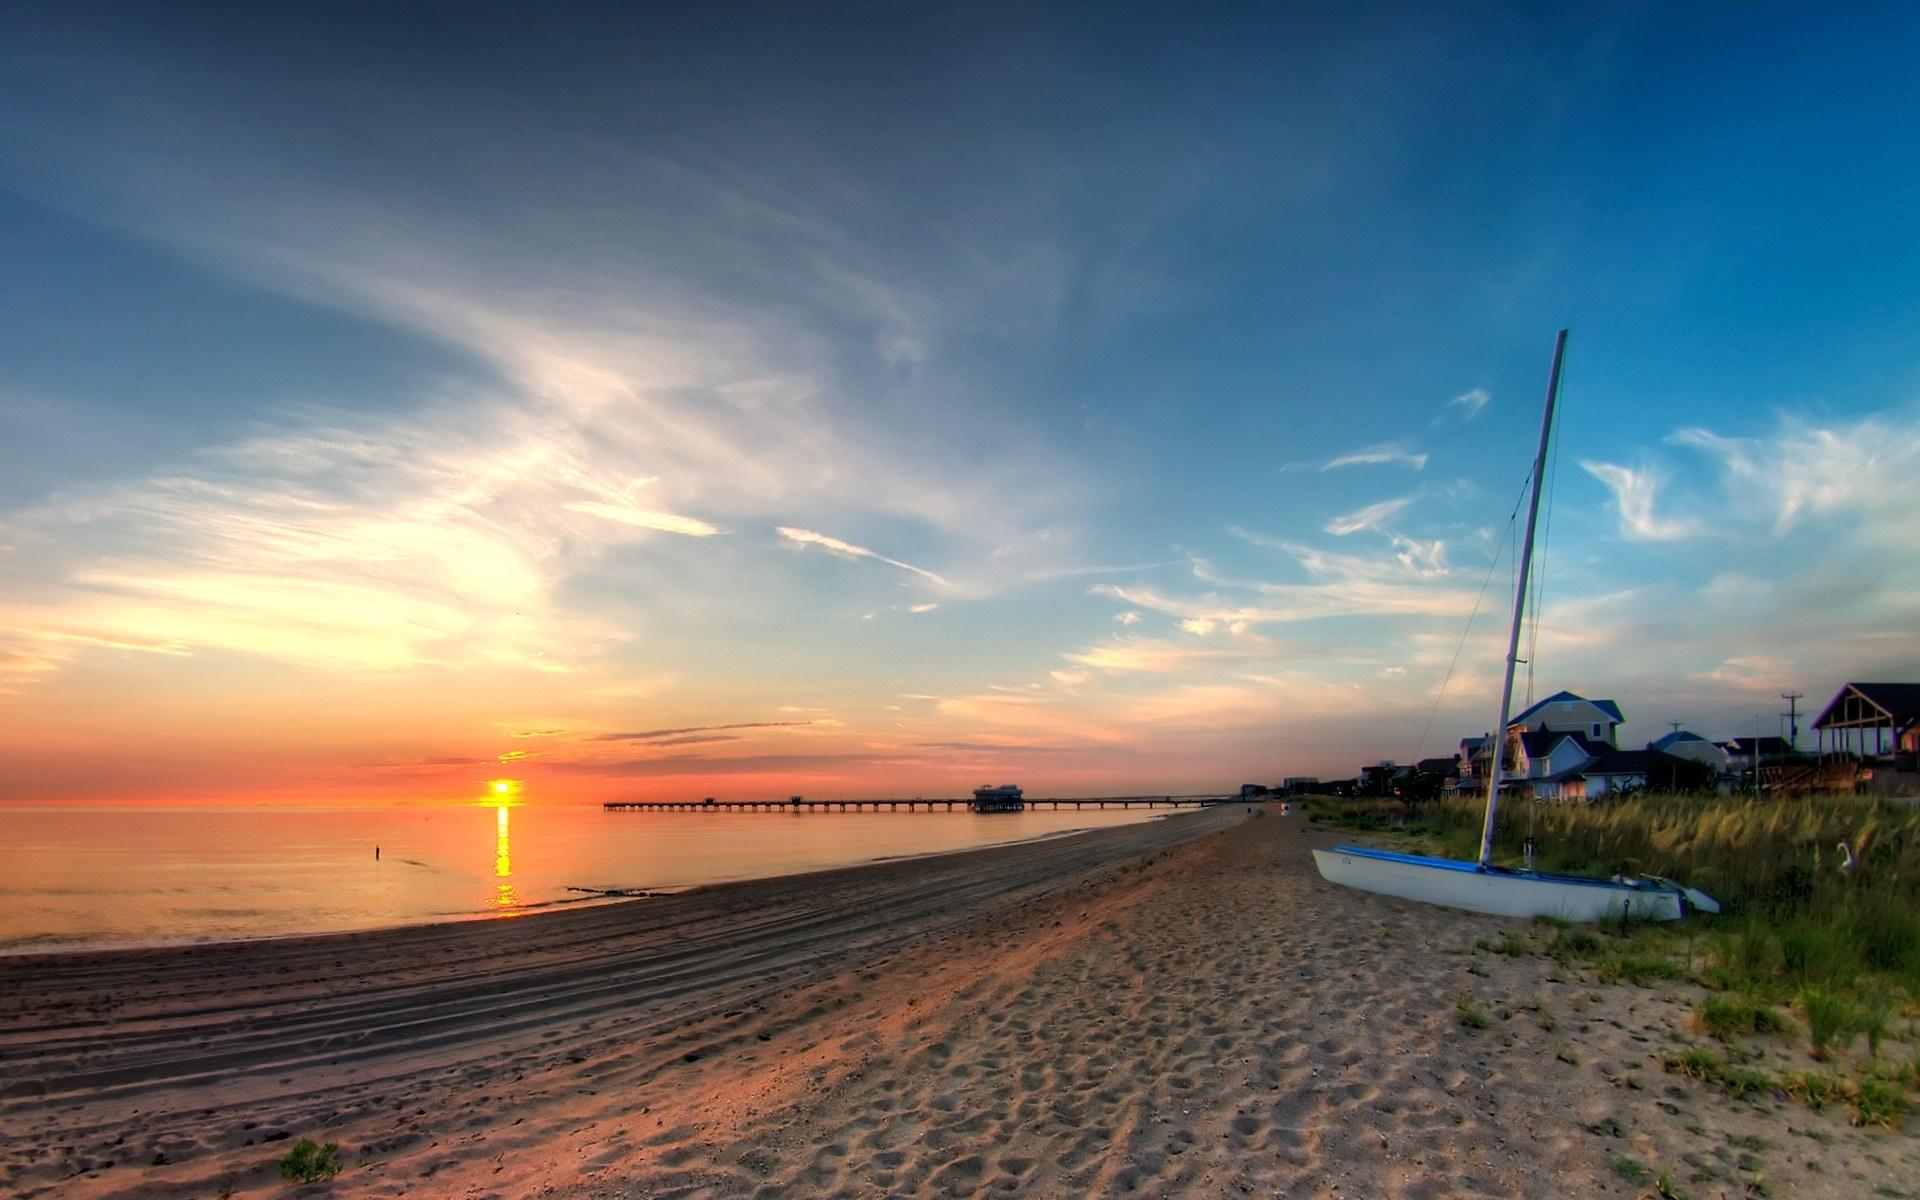 Ocean View Sunrise 1920x1200 #2192 HD Wallpaper Res: 1920x1200 ...